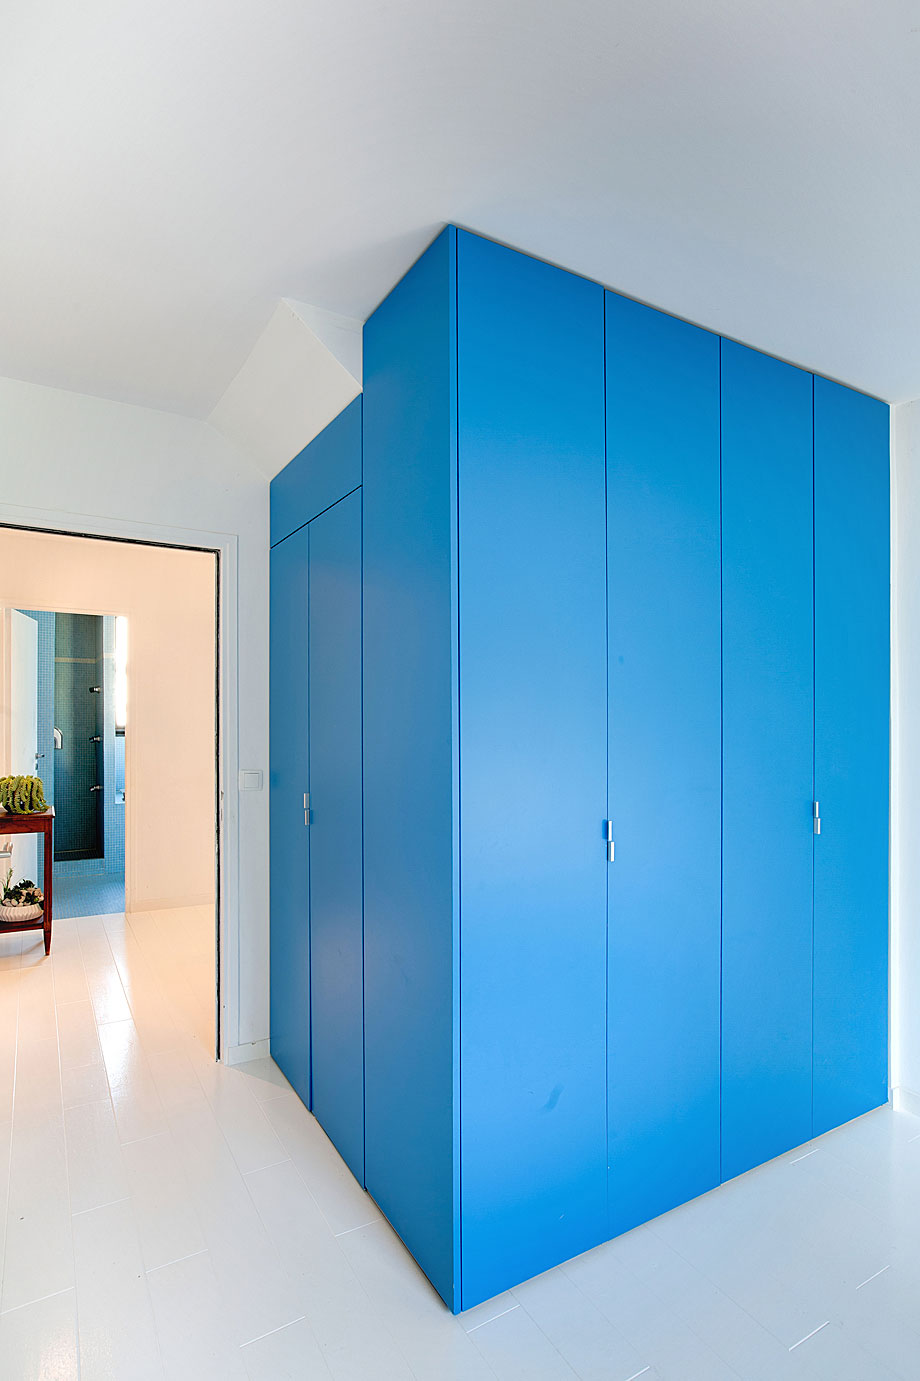 bookshelf-house-andrea-mosca-11